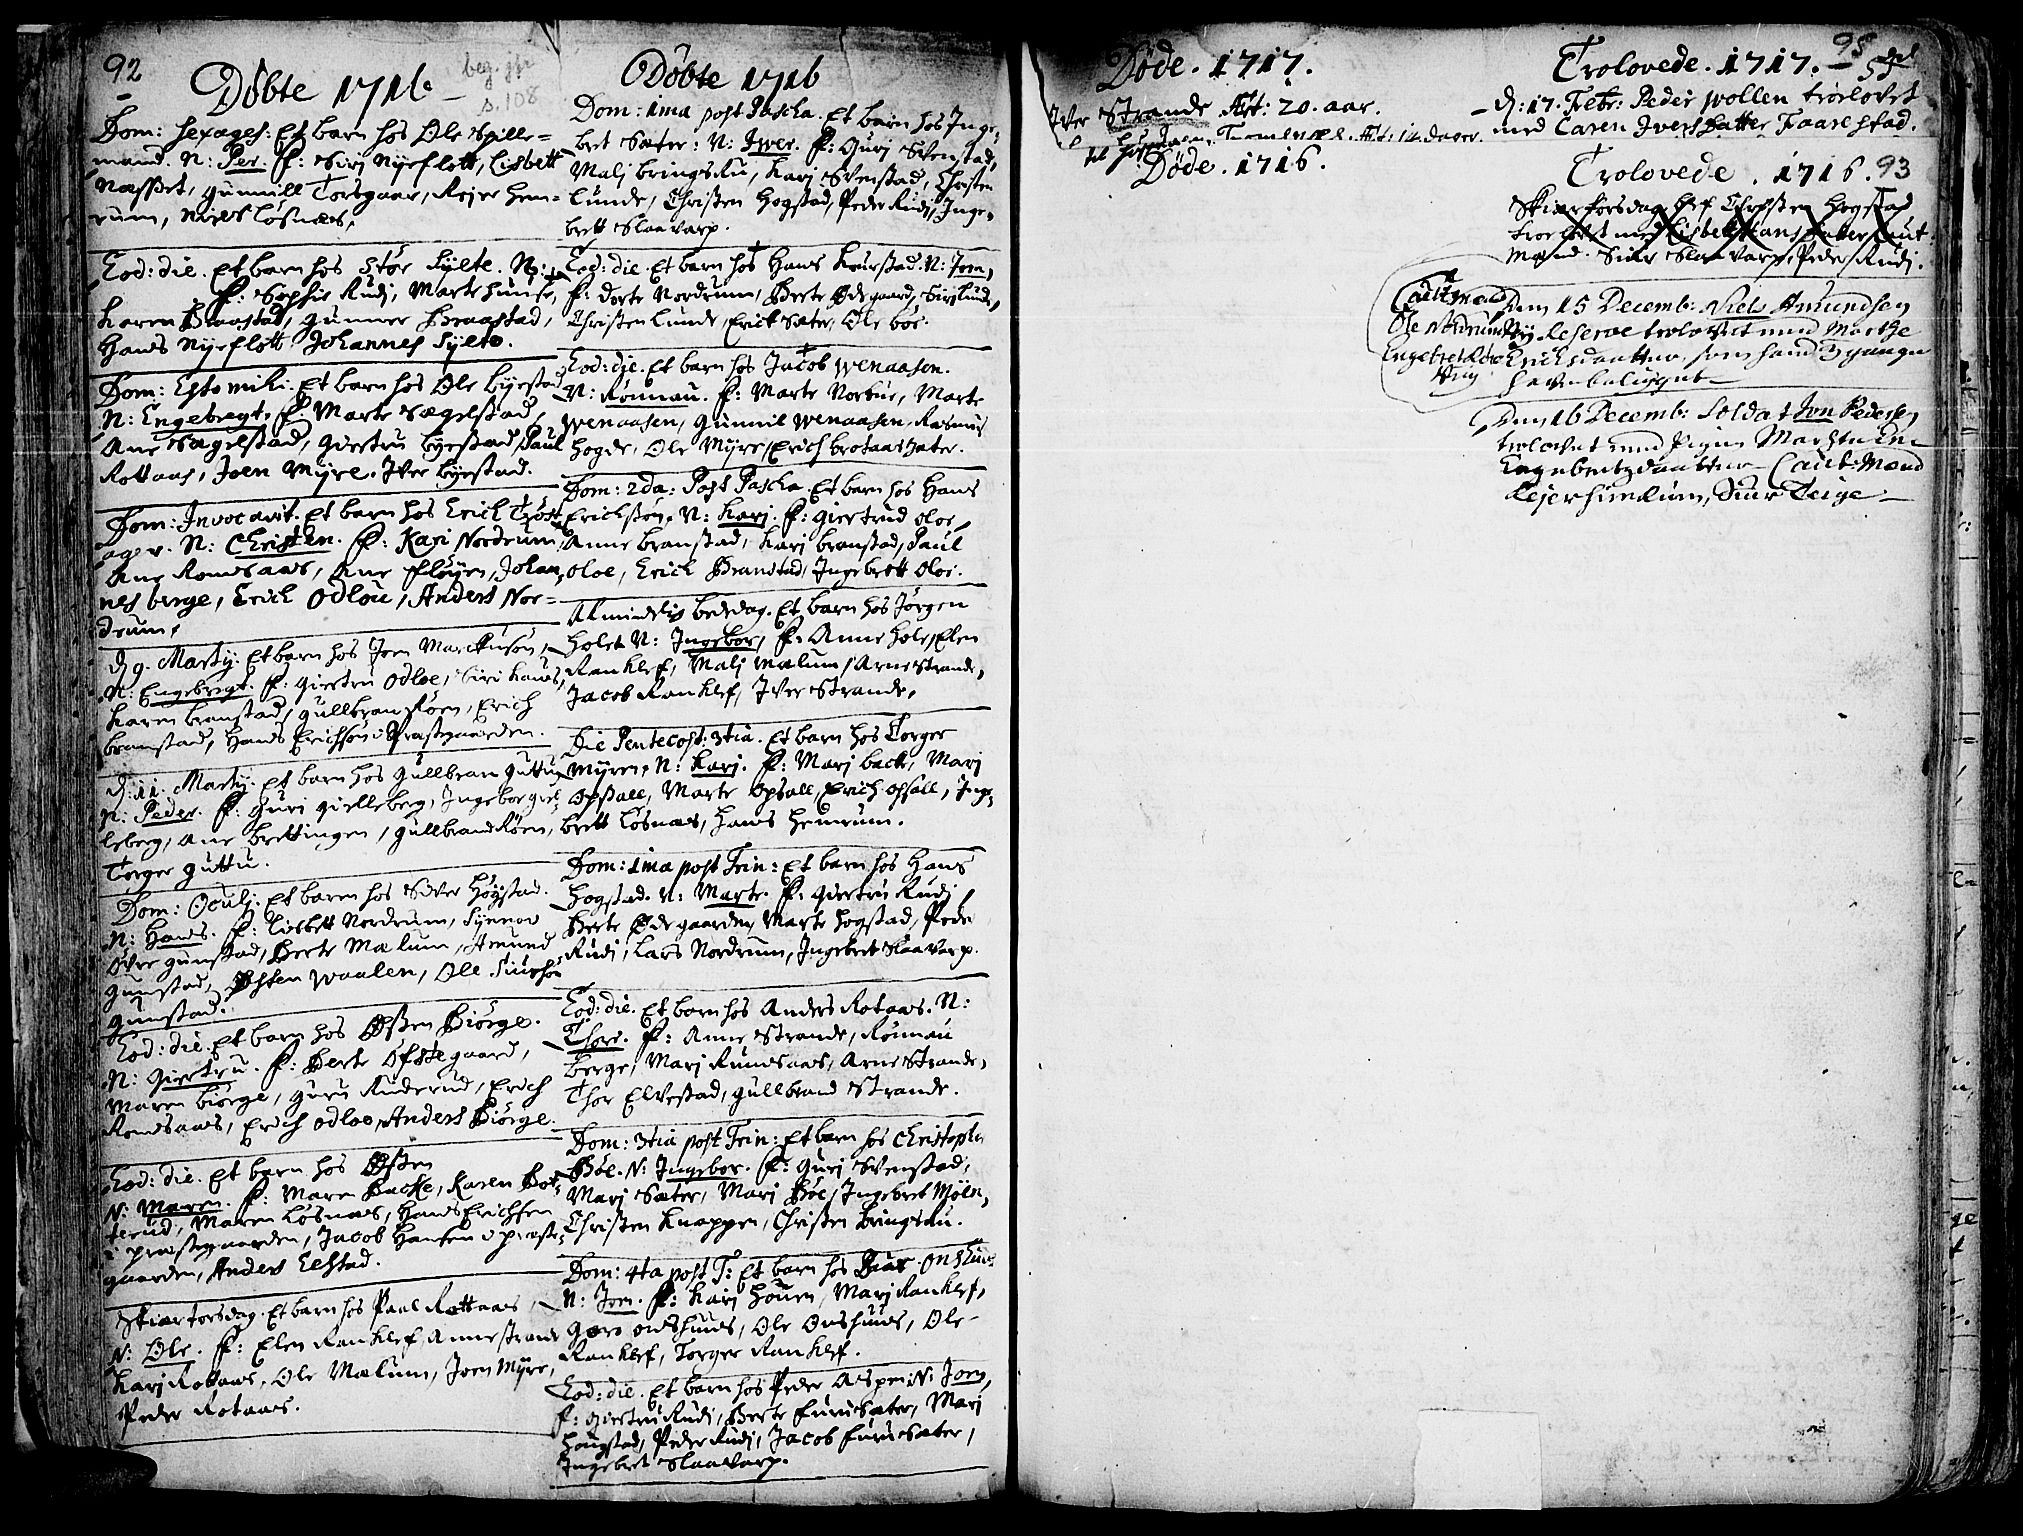 SAH, Ringebu prestekontor, Ministerialbok nr. 1, 1696-1733, s. 92-93